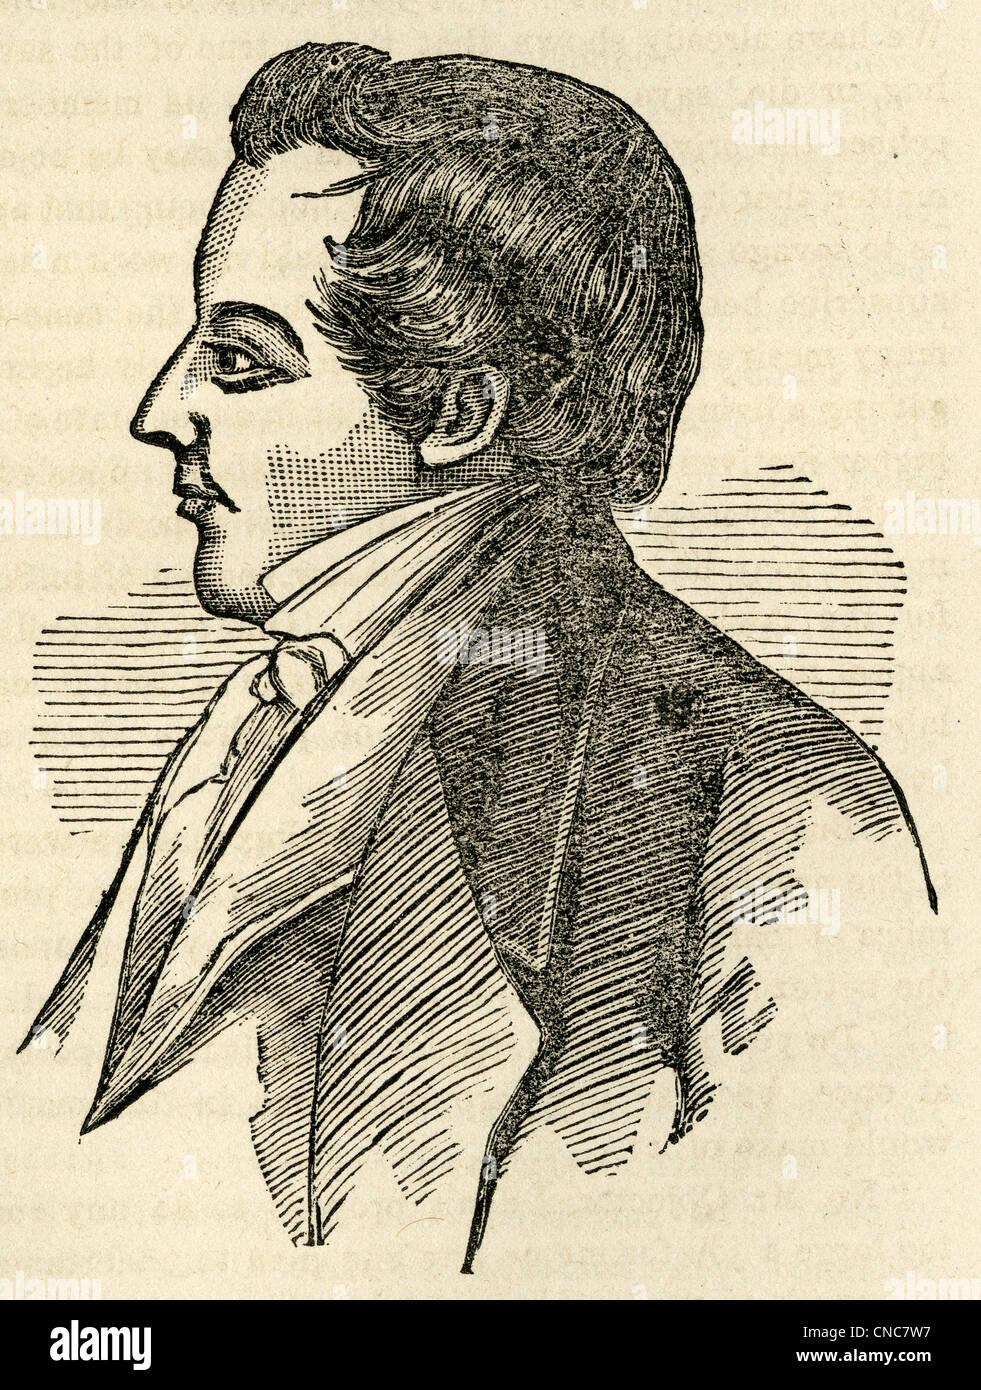 Simple 1871 woodcut engraving of Joseph Smith, Jr. - Stock Image